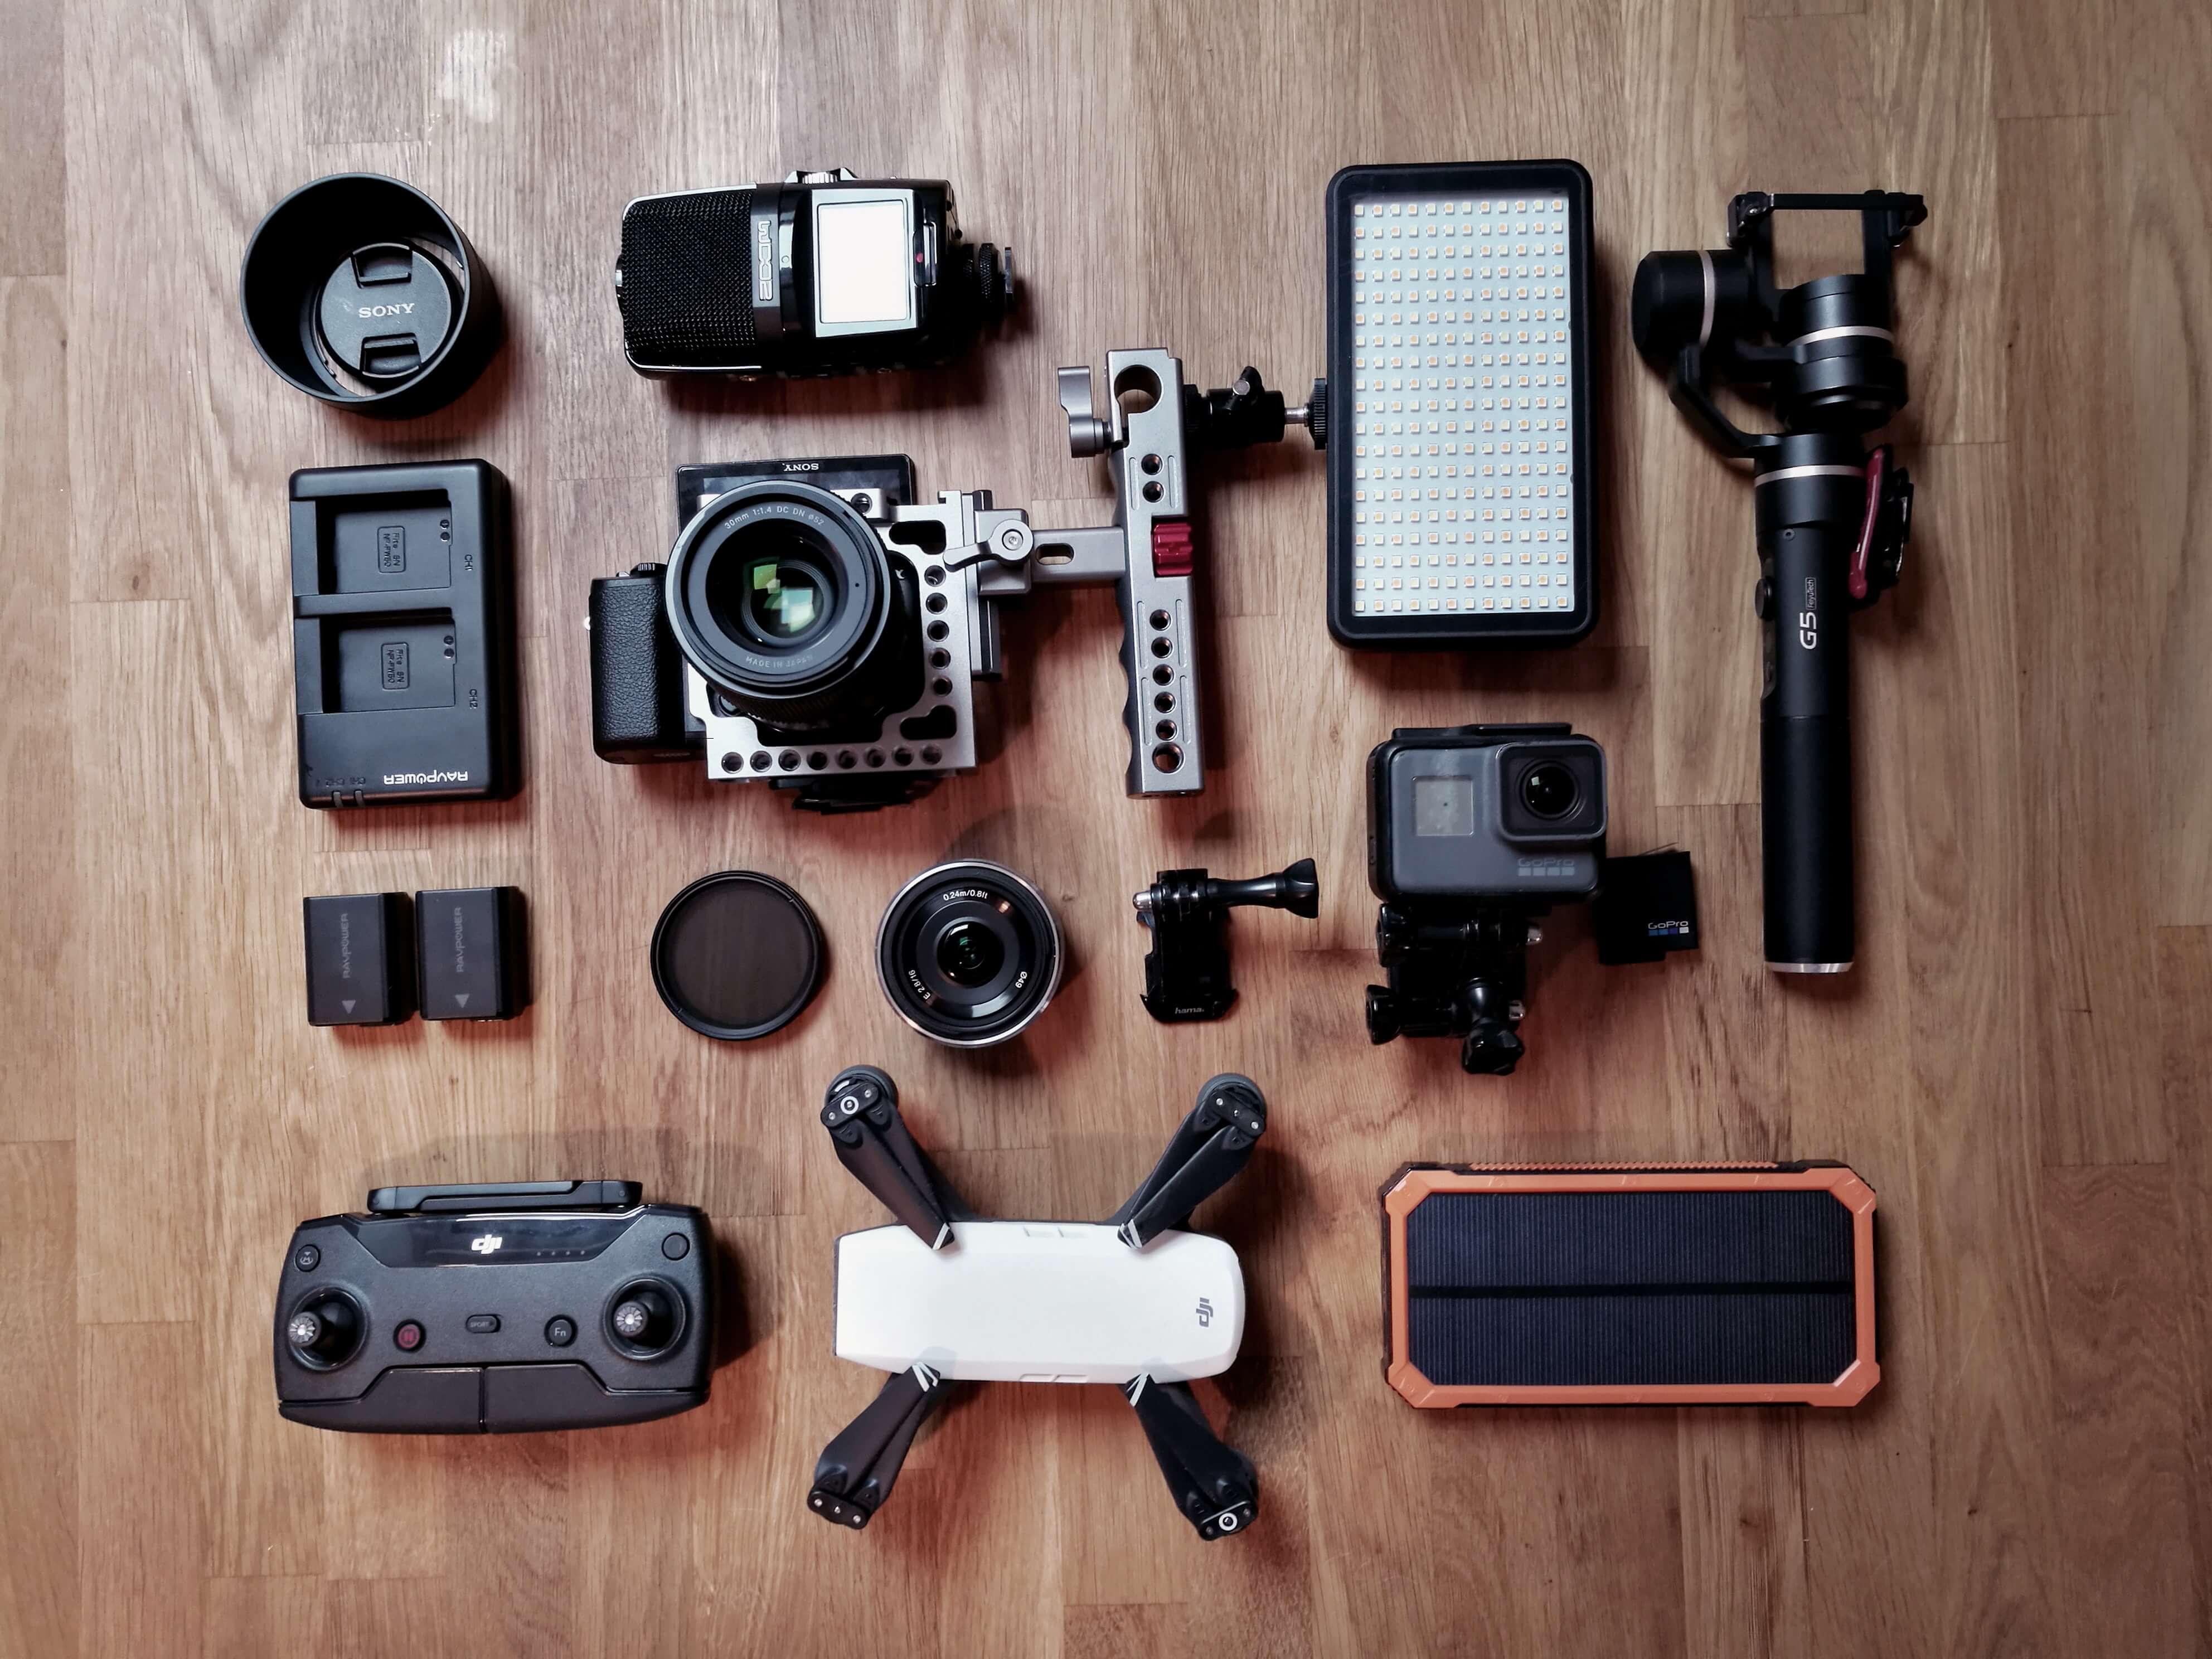 iPhone・スマホで本格的な動画撮影をするのに必要な機材を紹介!